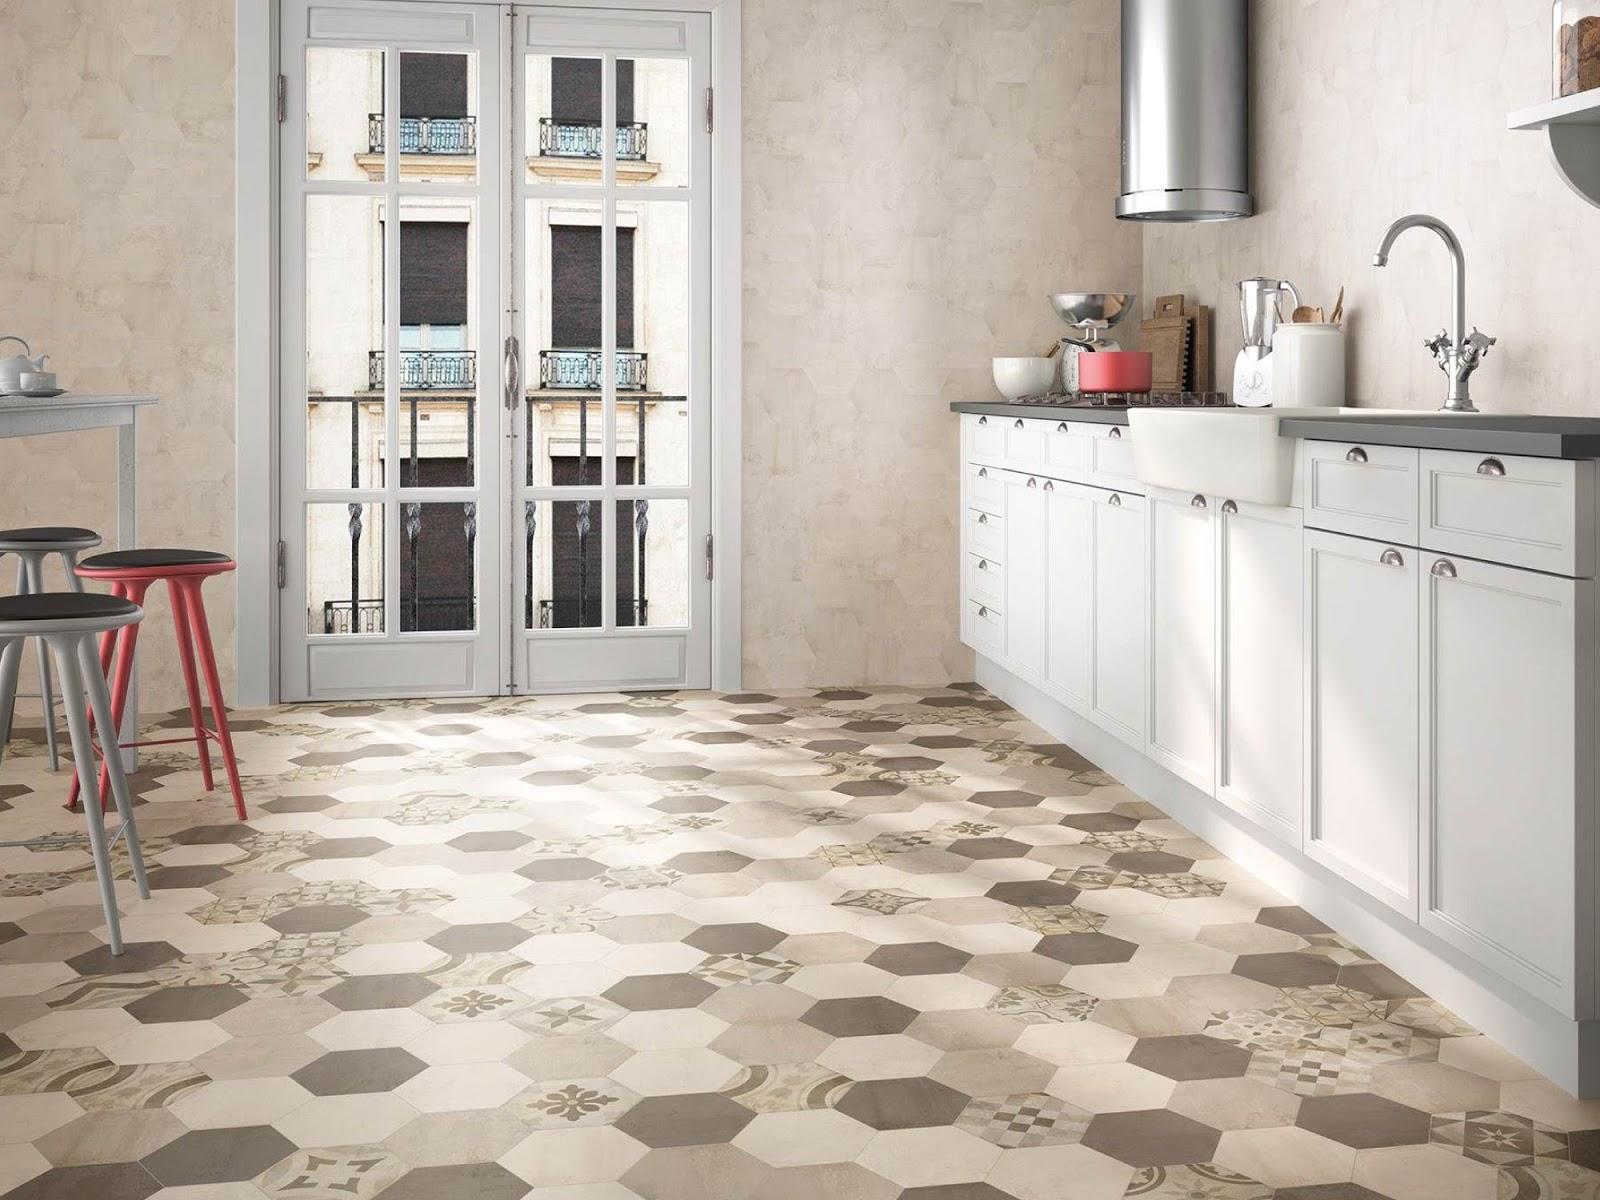 Interiores y 3d tipos de suelo para cocinas for Baldosas para cocina